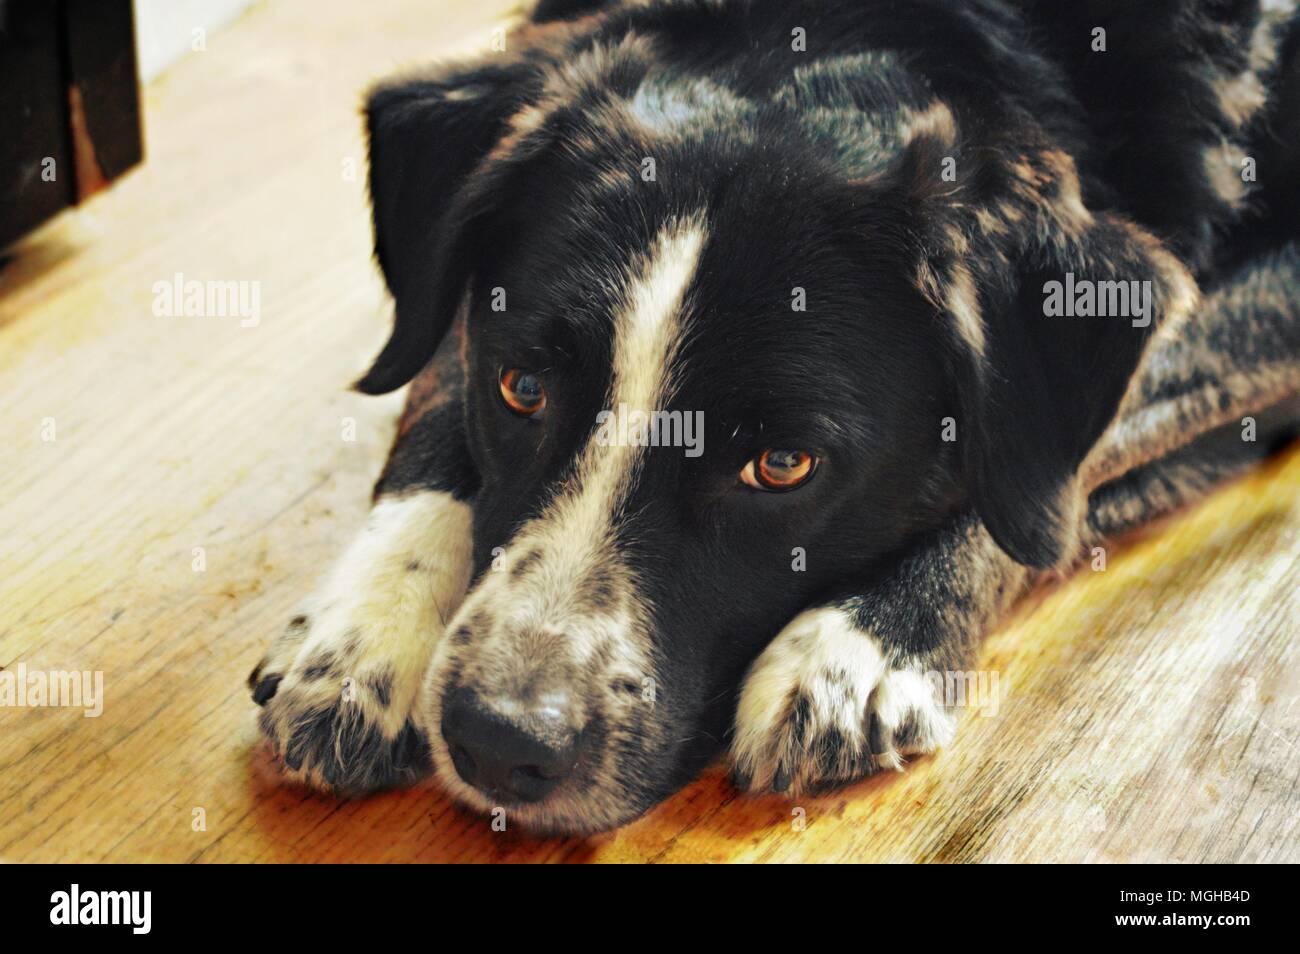 Ein Tag in einem Hunde leben Stockbild